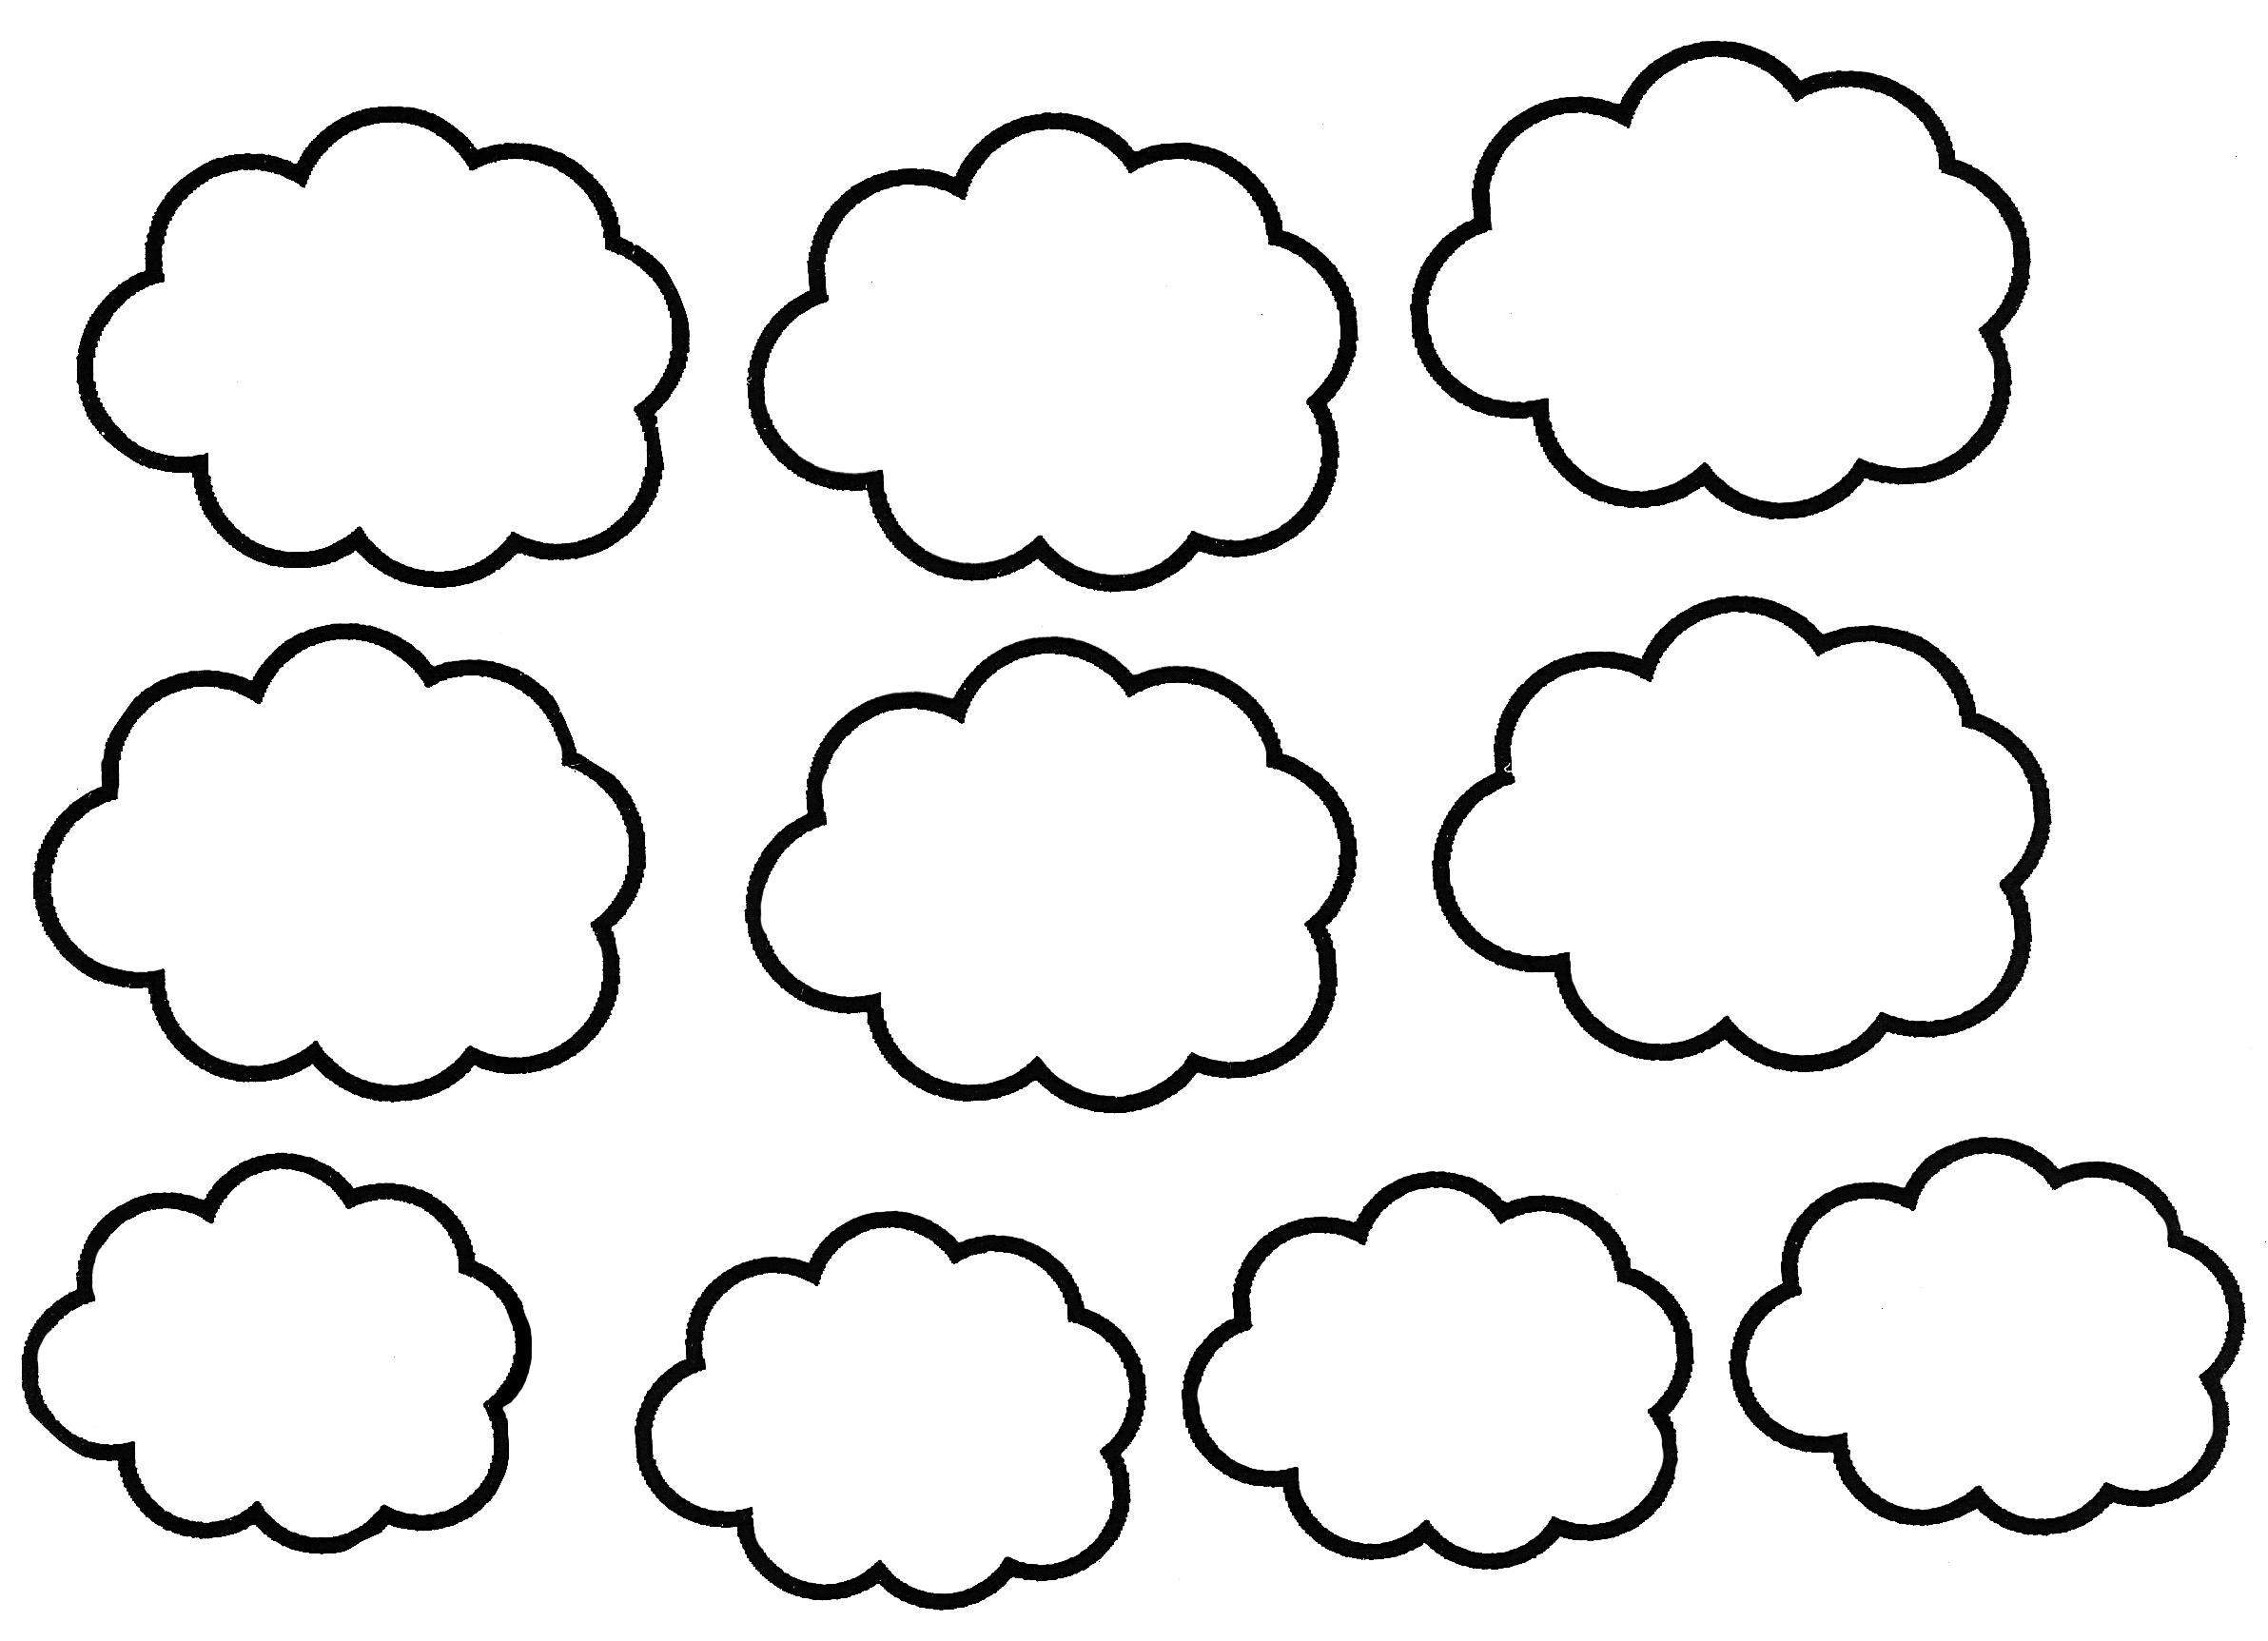 39_clouds.jpg